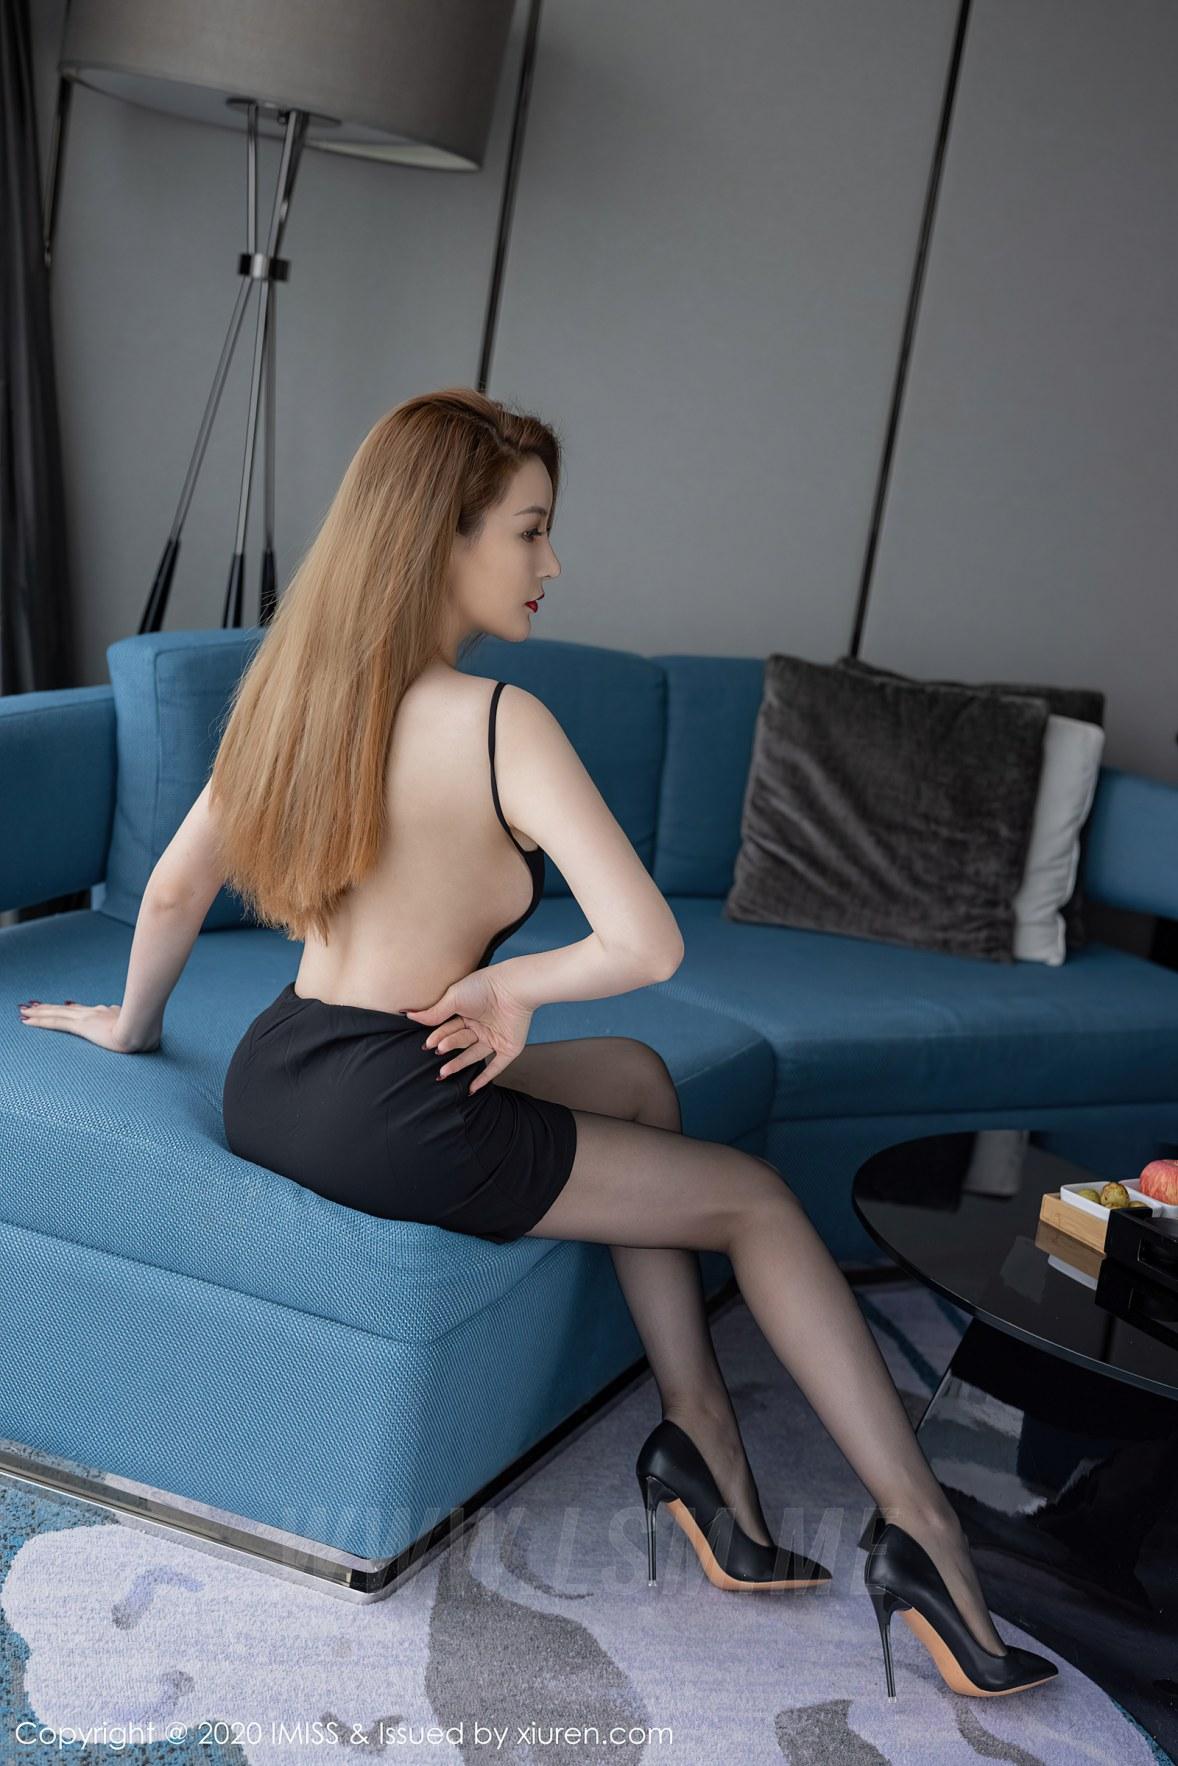 IMiss 爱蜜社 Vol.536 黑丝吊裙玉背 jermy - 4